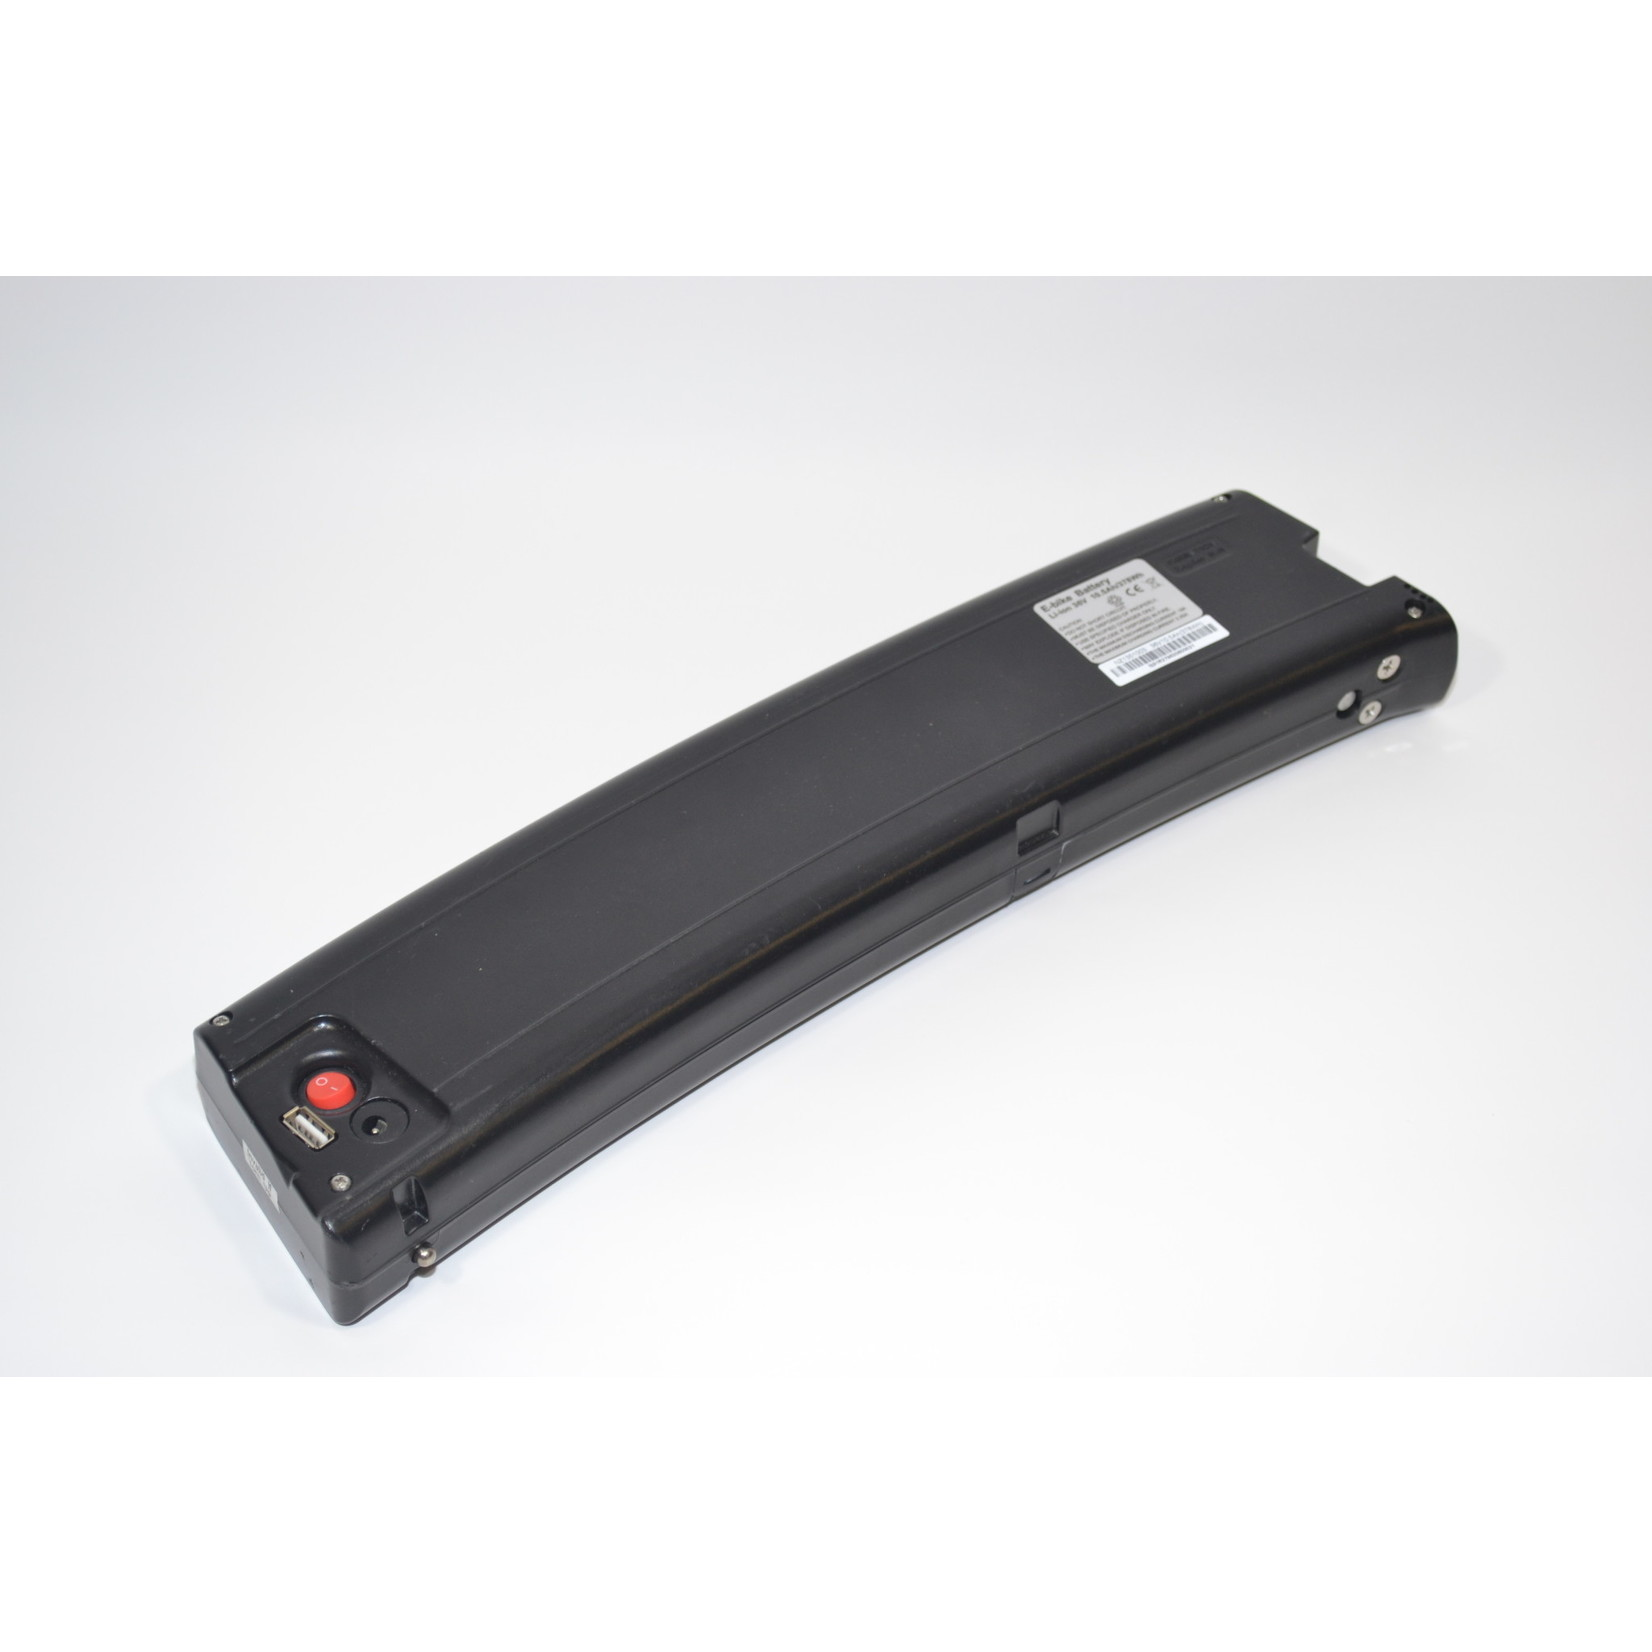 Reetrin-Greenway Battery - Jetty 4.0